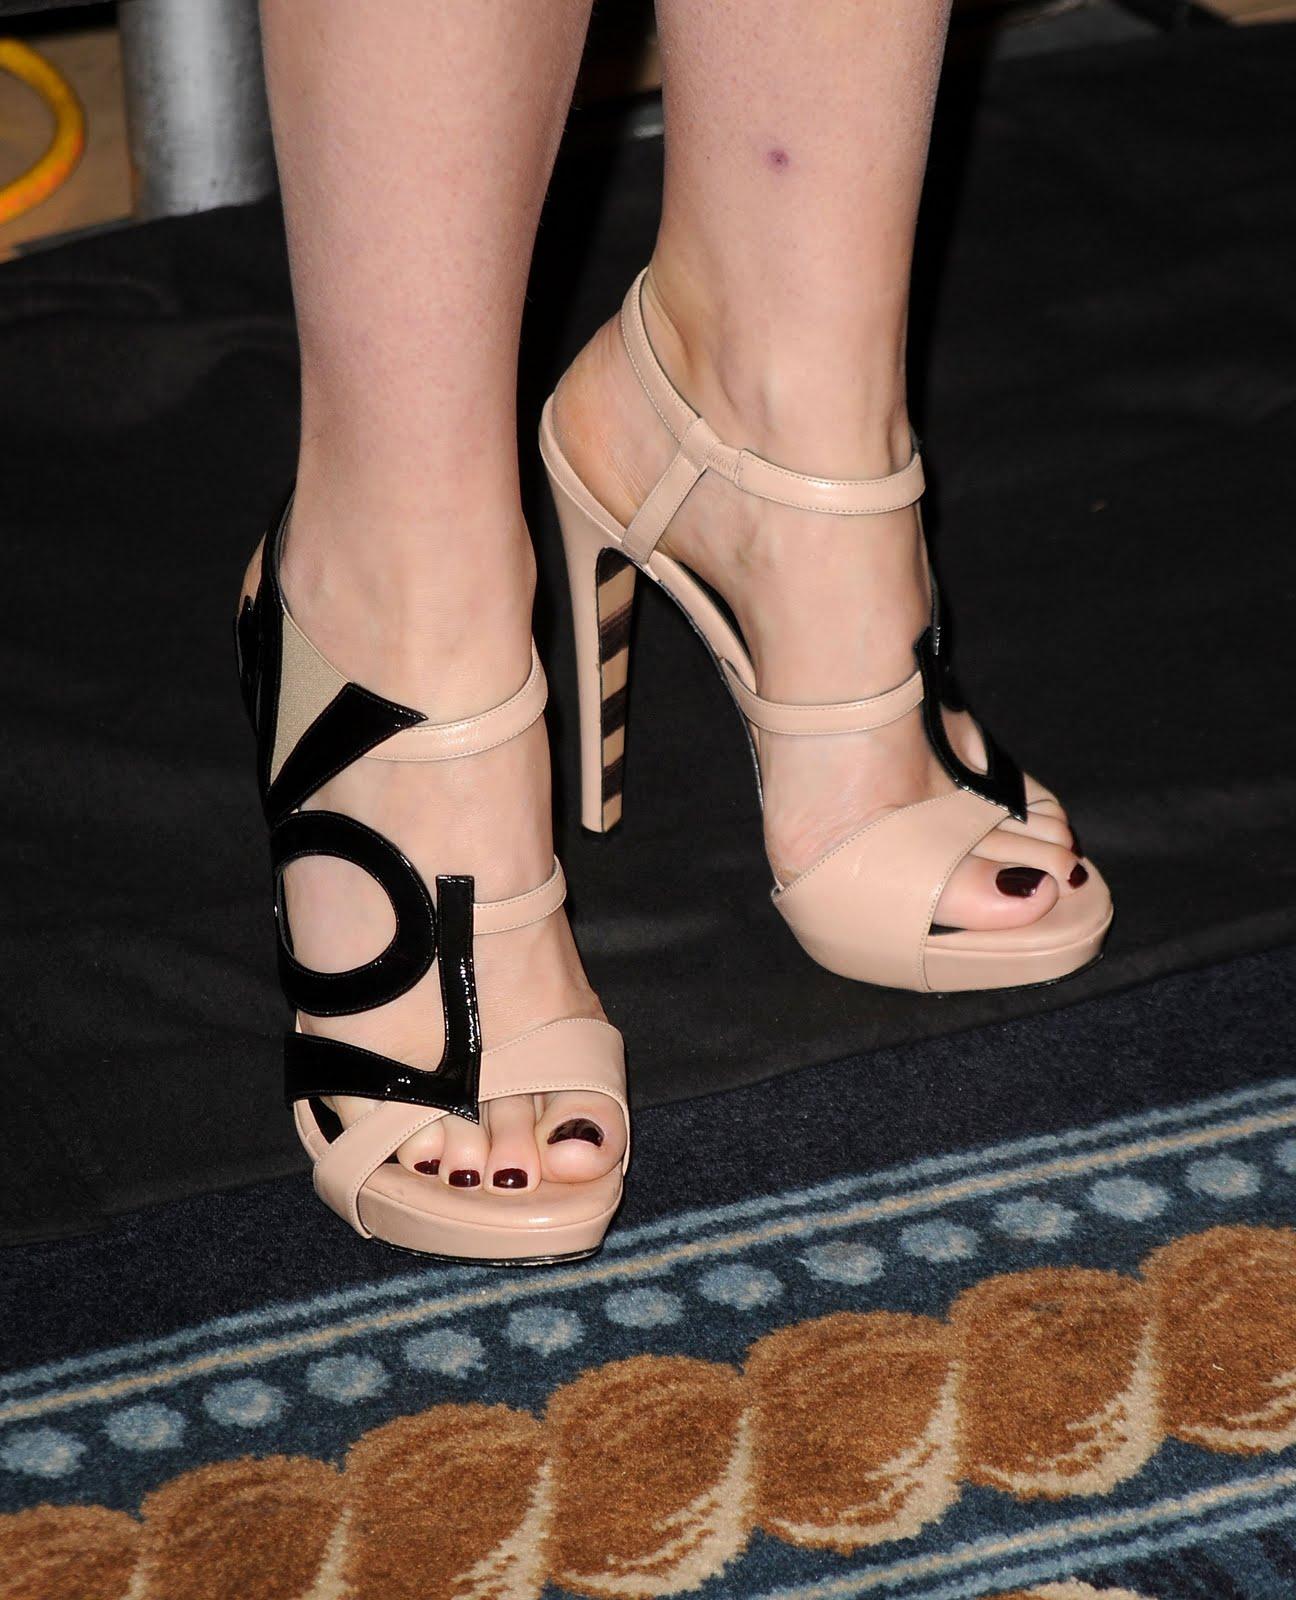 http://2.bp.blogspot.com/_bQ0SqifjNcg/TCWXfb29DWI/AAAAAAAAW00/Z3hfUN9HcGY/s1600/gwyneth-paltrow-feet-4.jpg